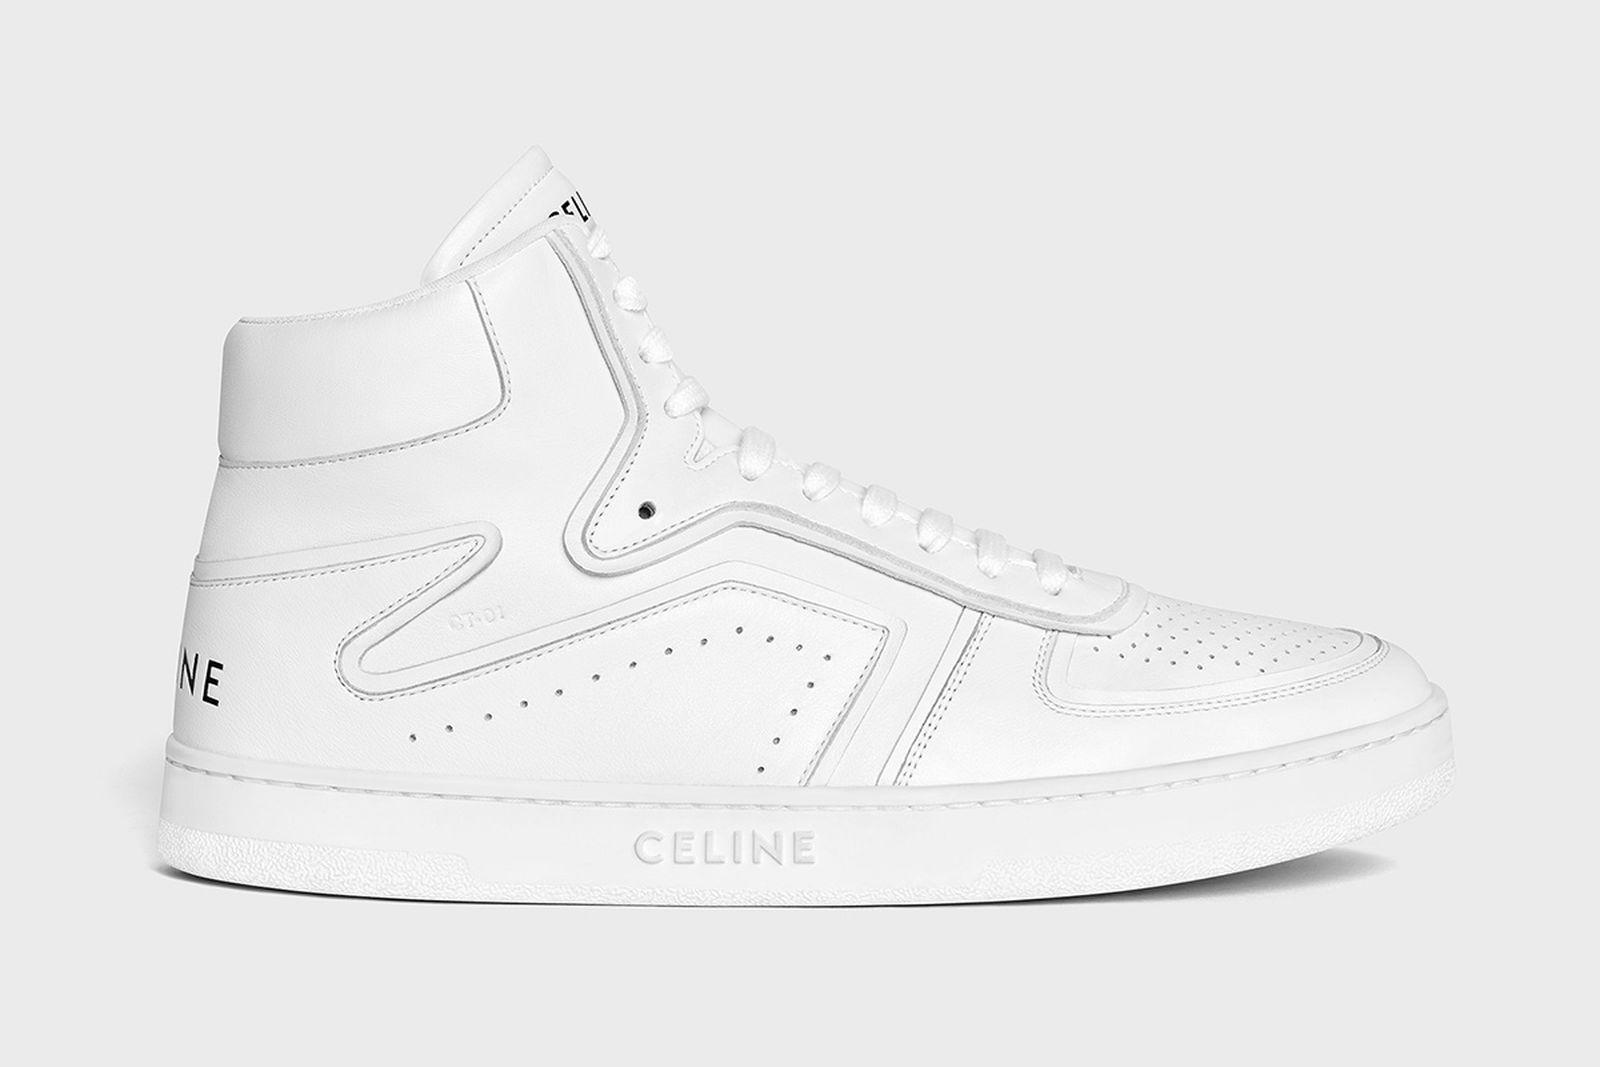 celine-trainer-1-release-date-price-09